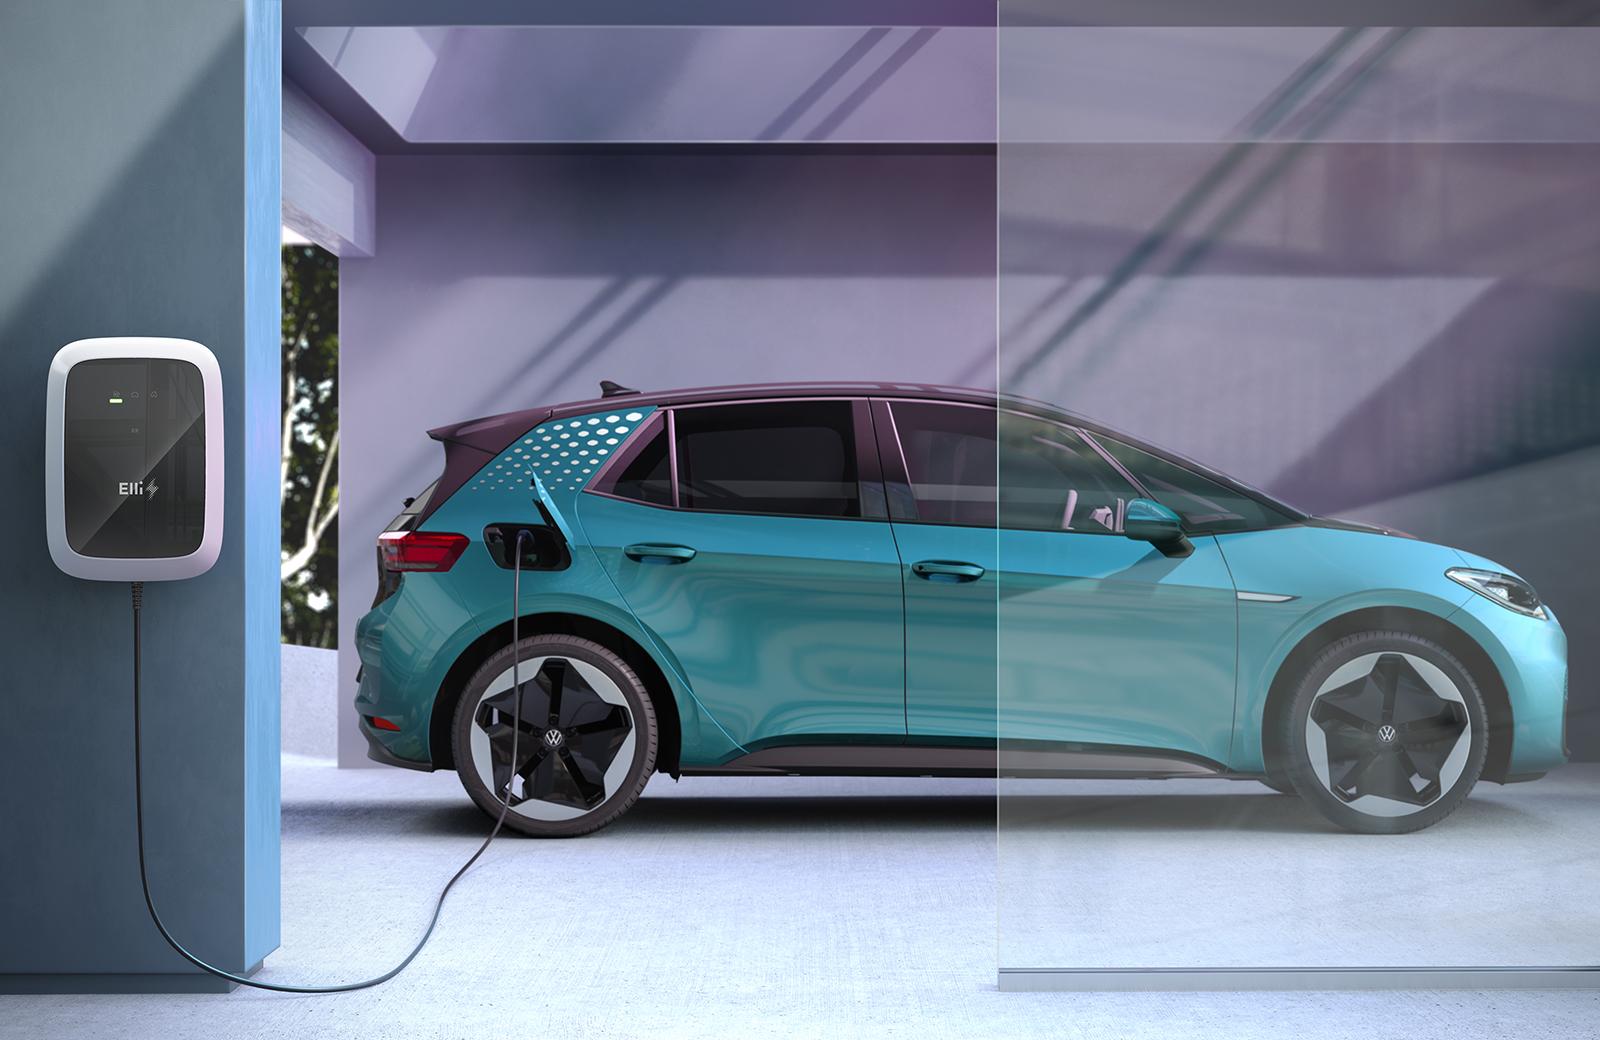 E-car home charging